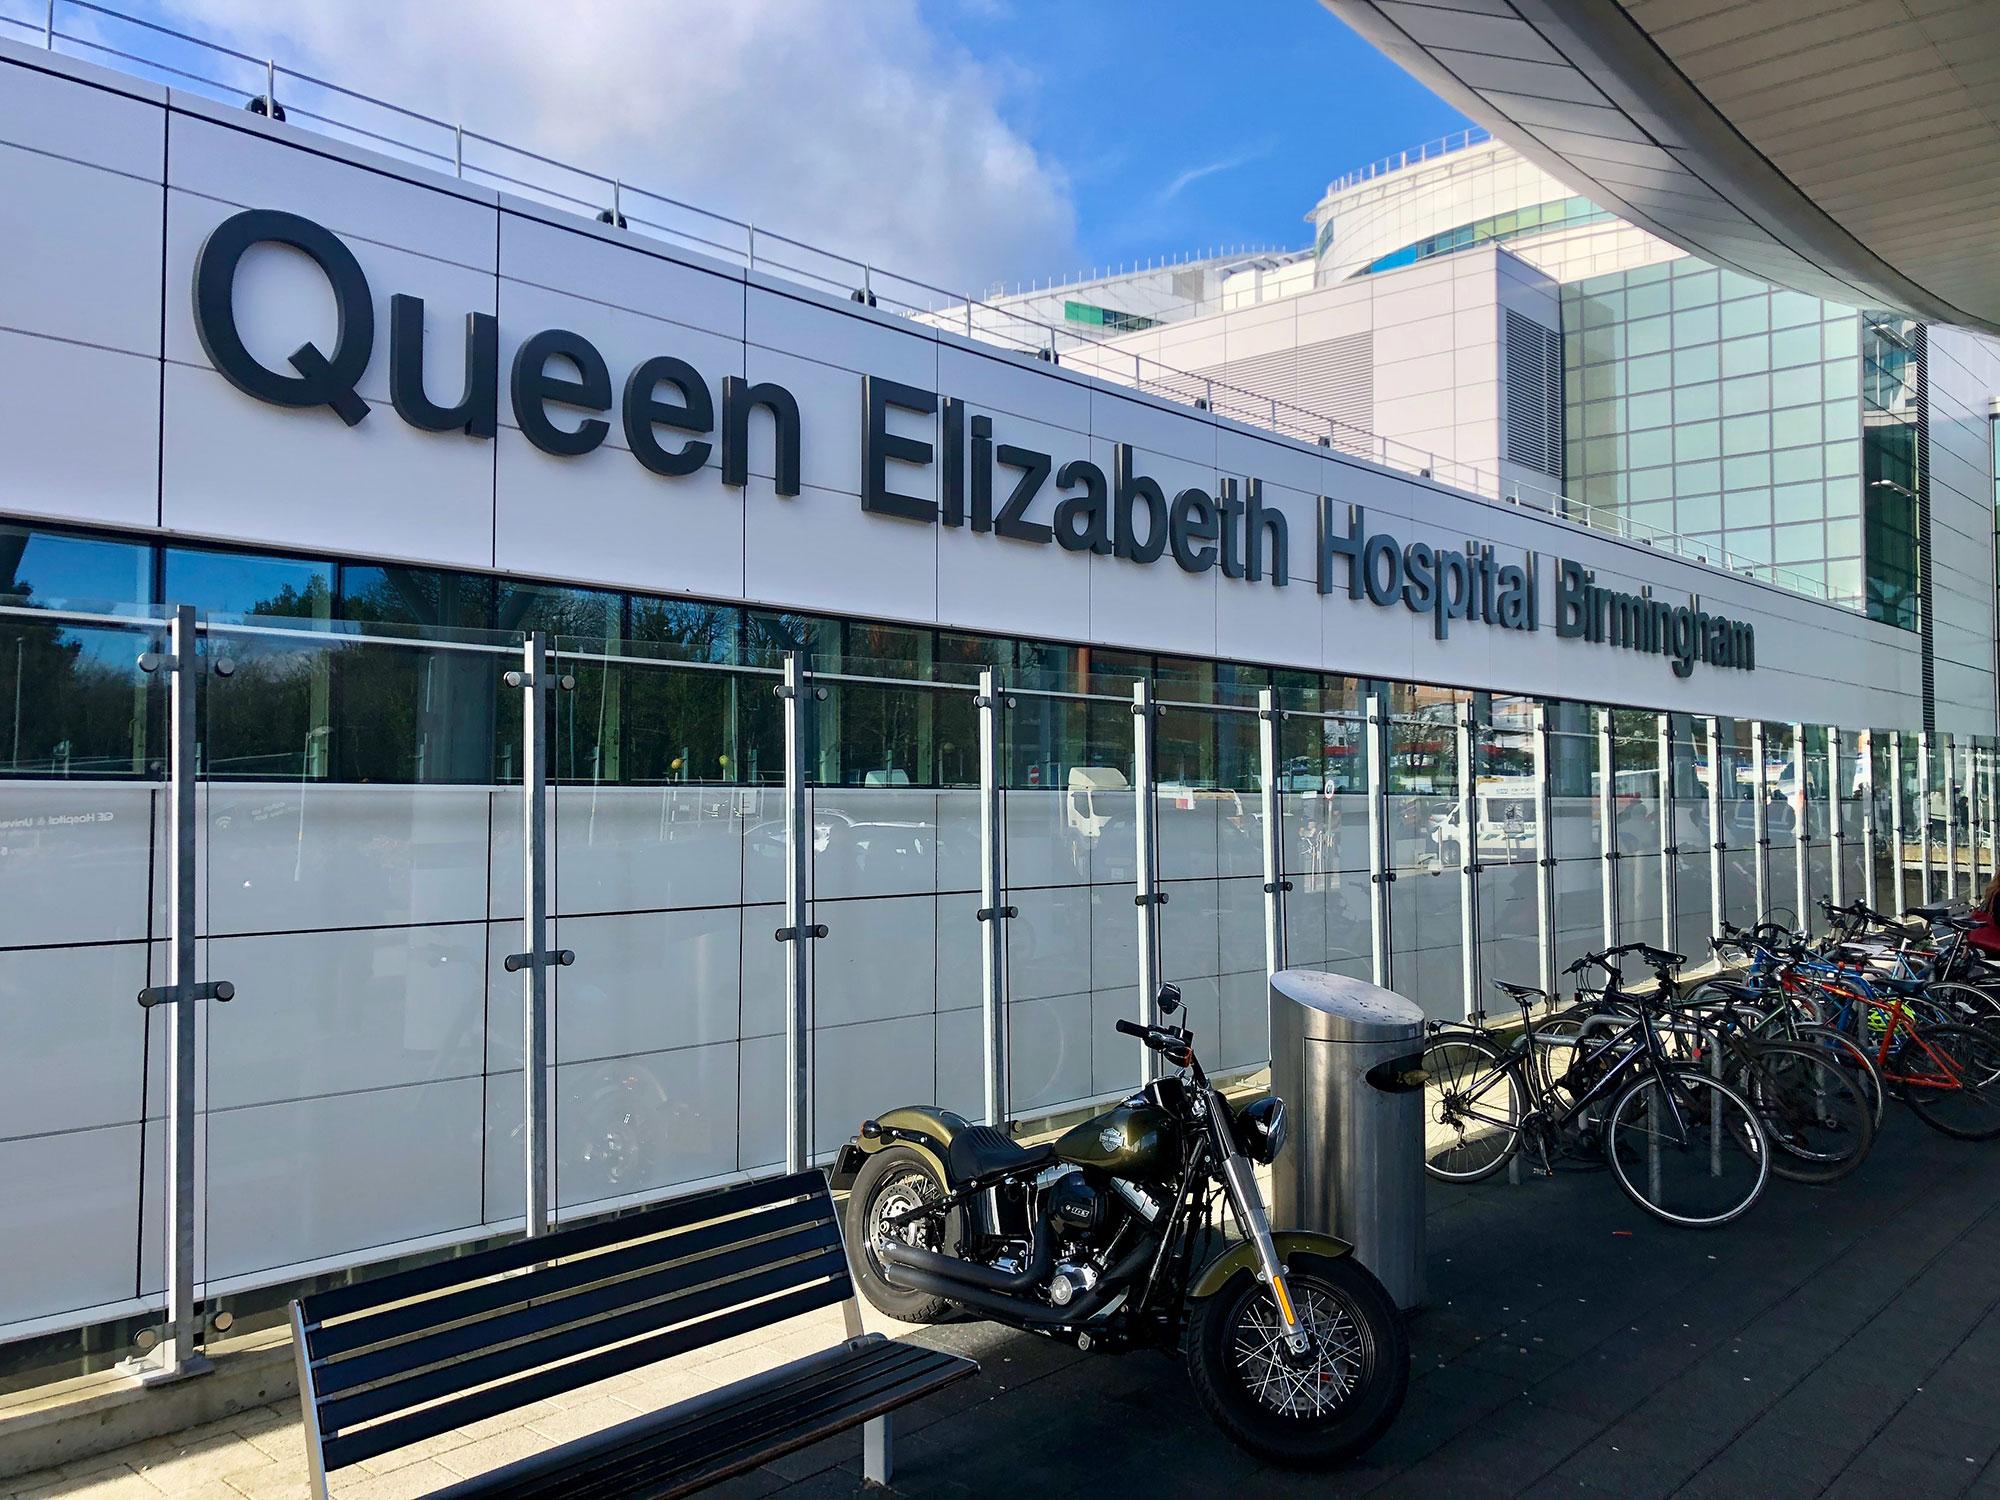 Queen Elizabeth Hospital Birmingham outside view entrance